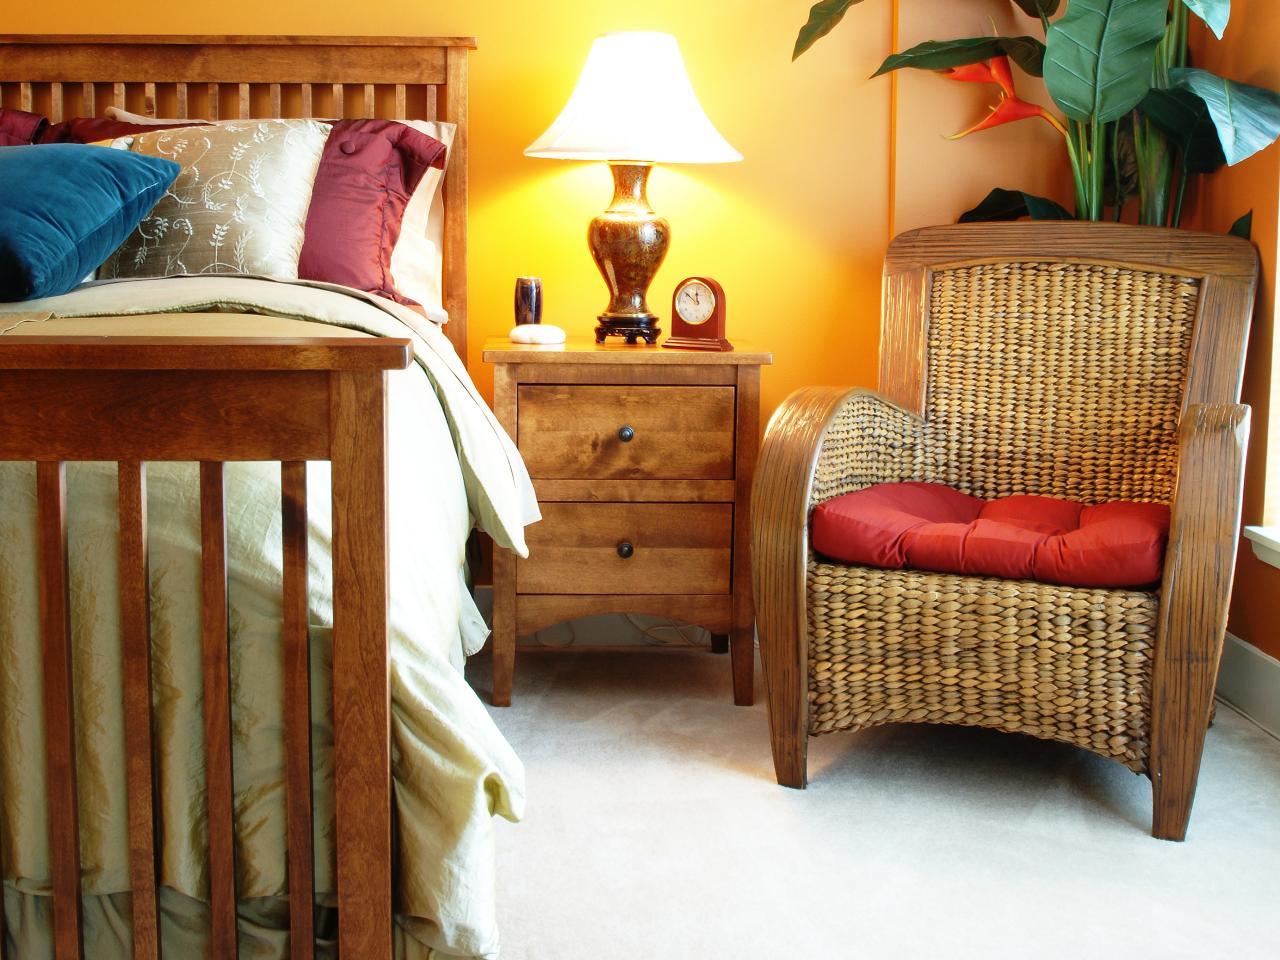 Bedroom wicker chairs